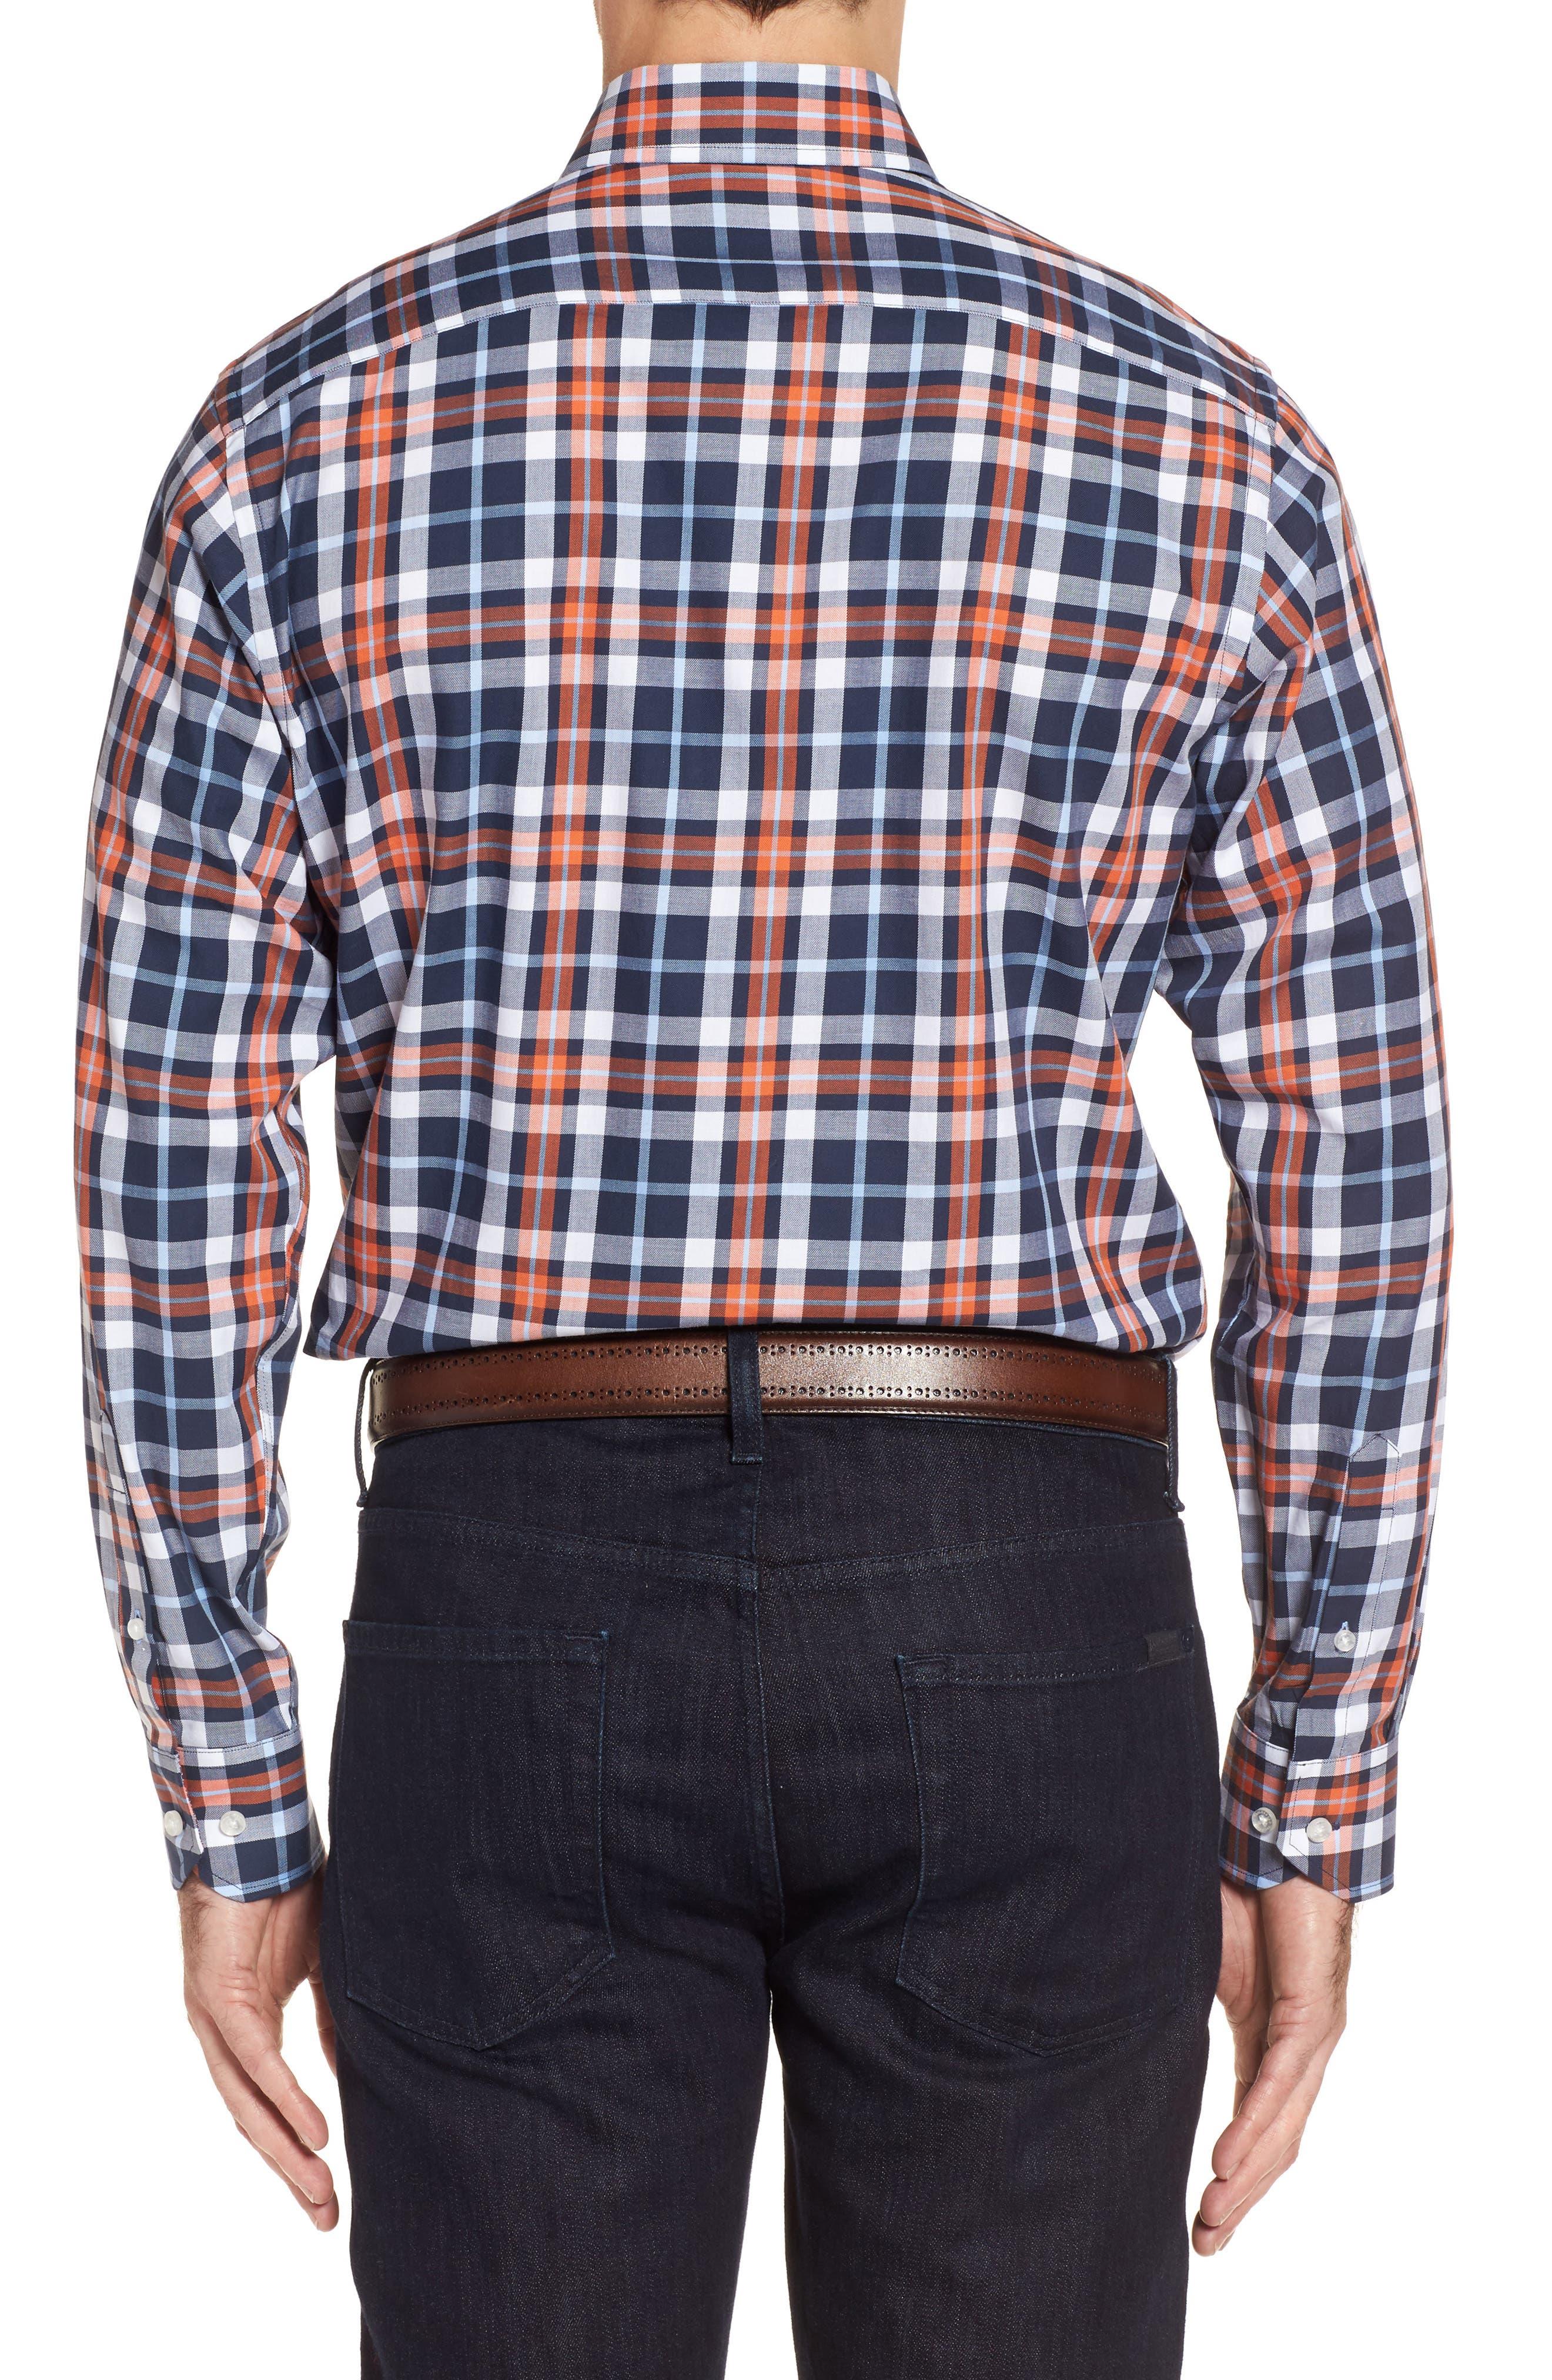 Alternate Image 2  - TailorByrd Chatham Regular Fit Plaid Sport Shirt